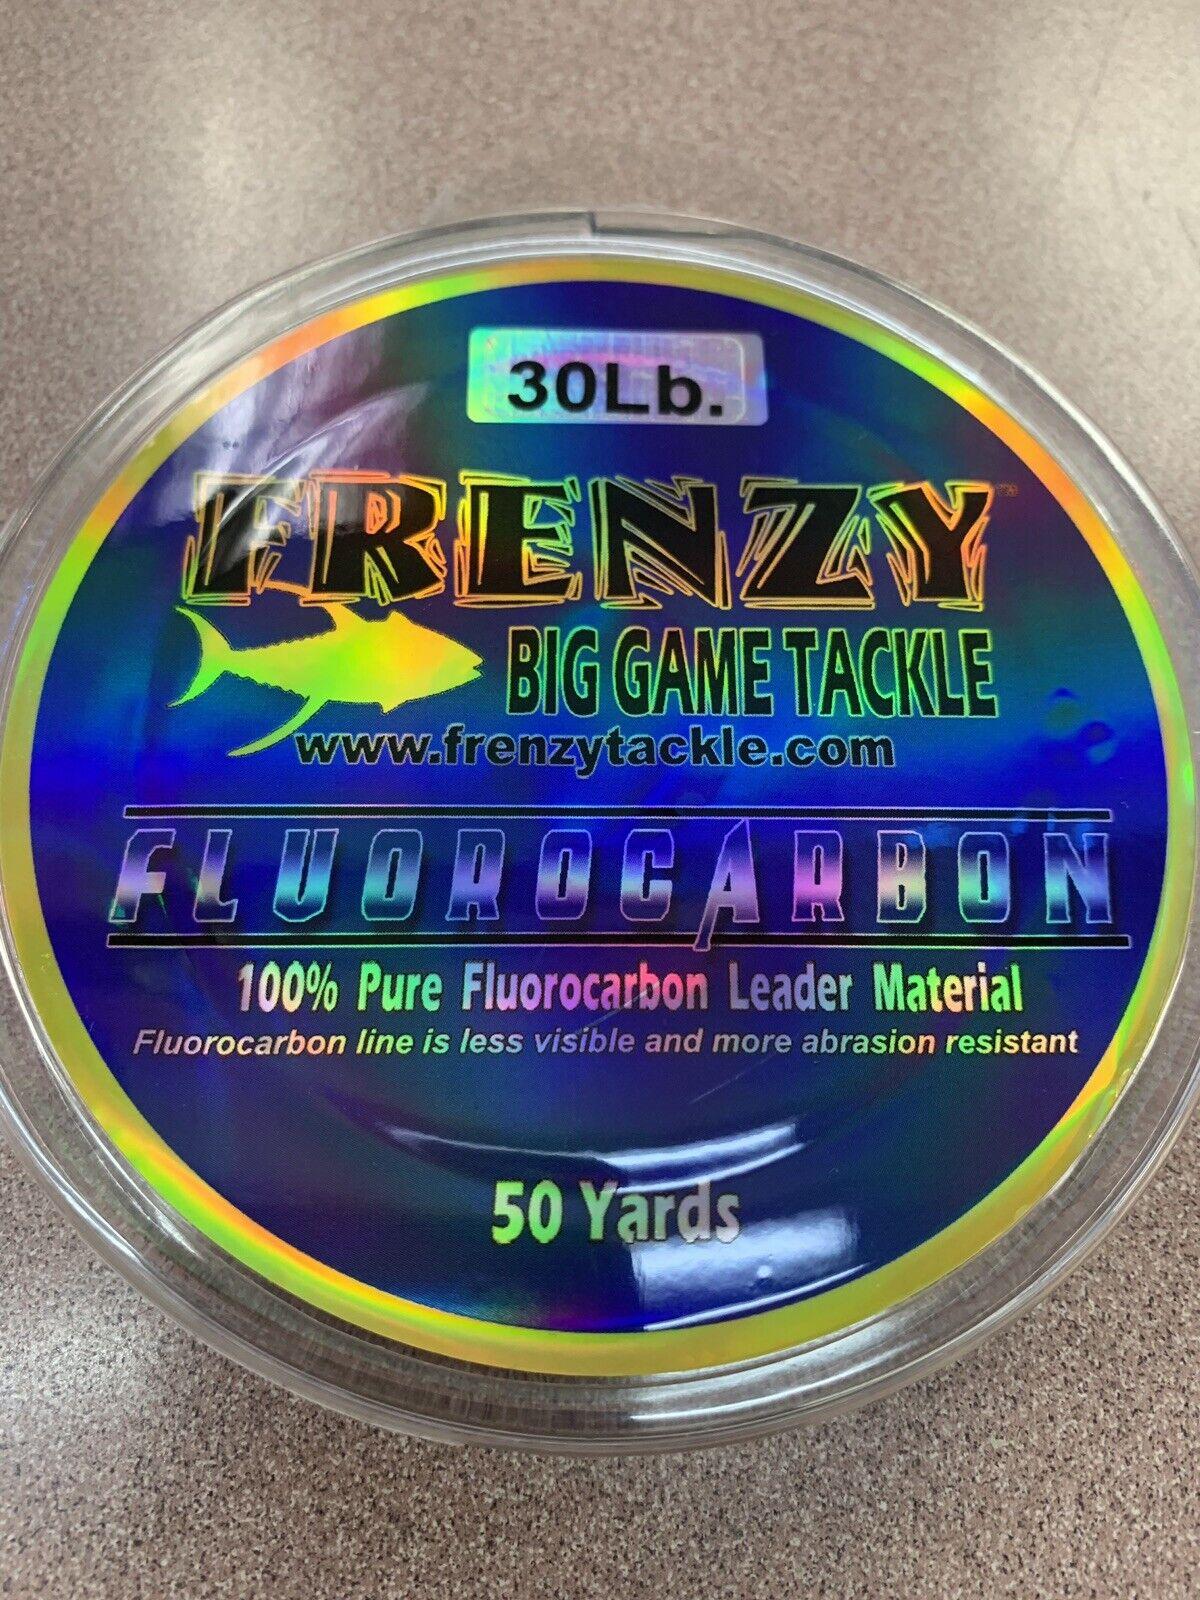 Frenzy Flugoldcarbon Leader 30Lb Clear 50 Yards - Reusable Spool - CL3050